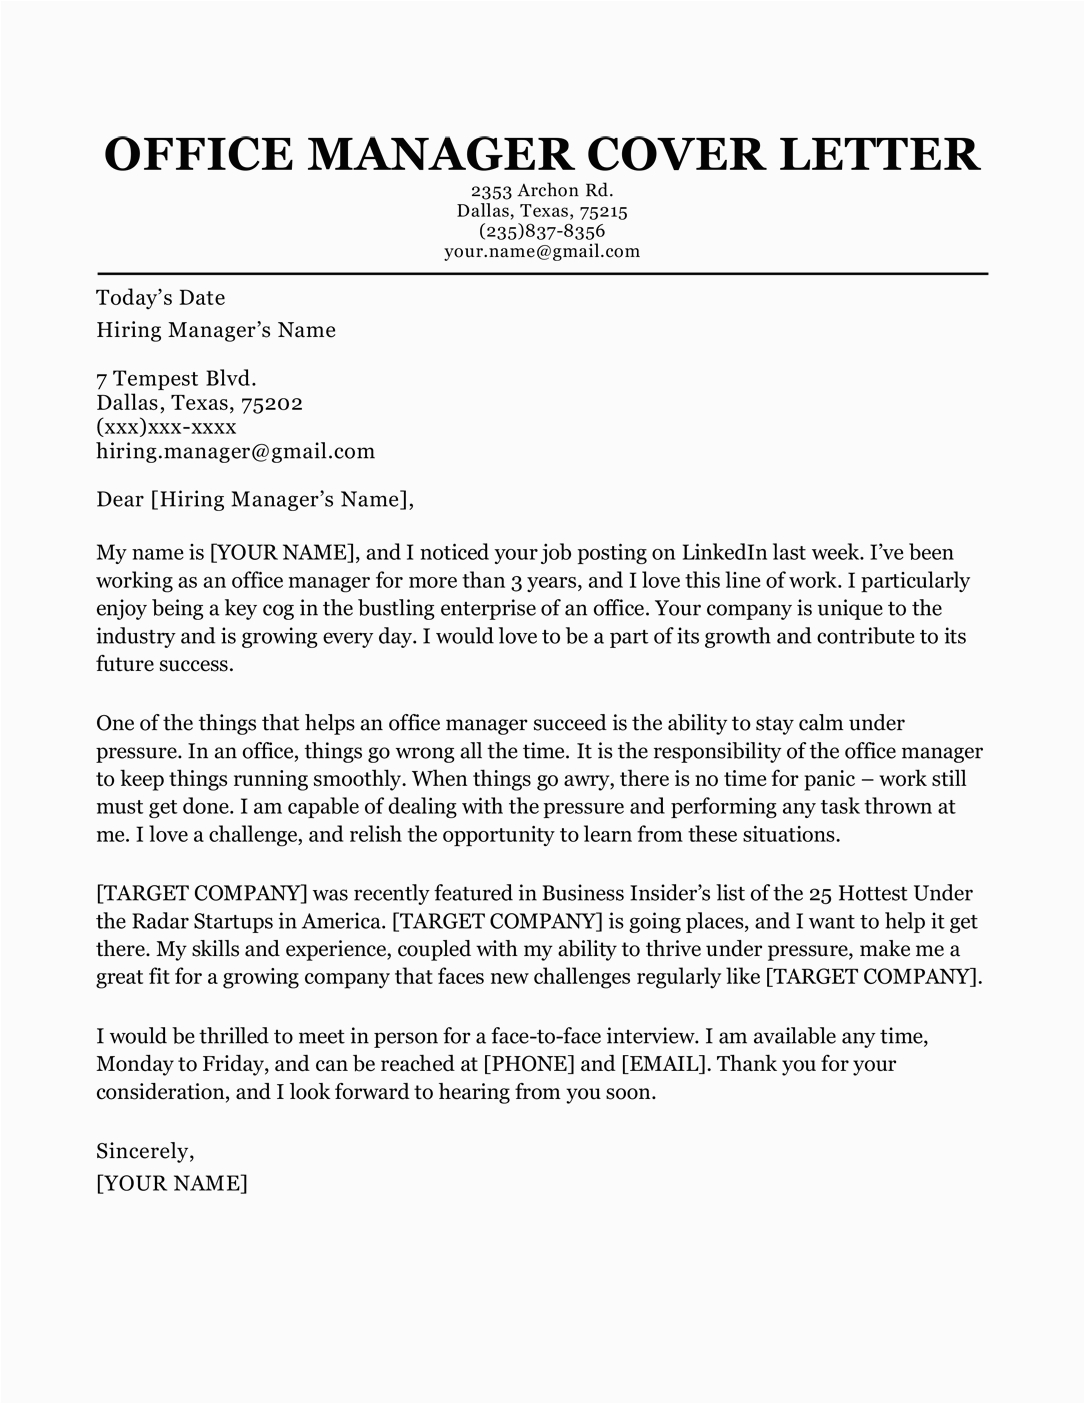 Sample Cover Letter for Resume Management Fice Manager Cover Letter Sample